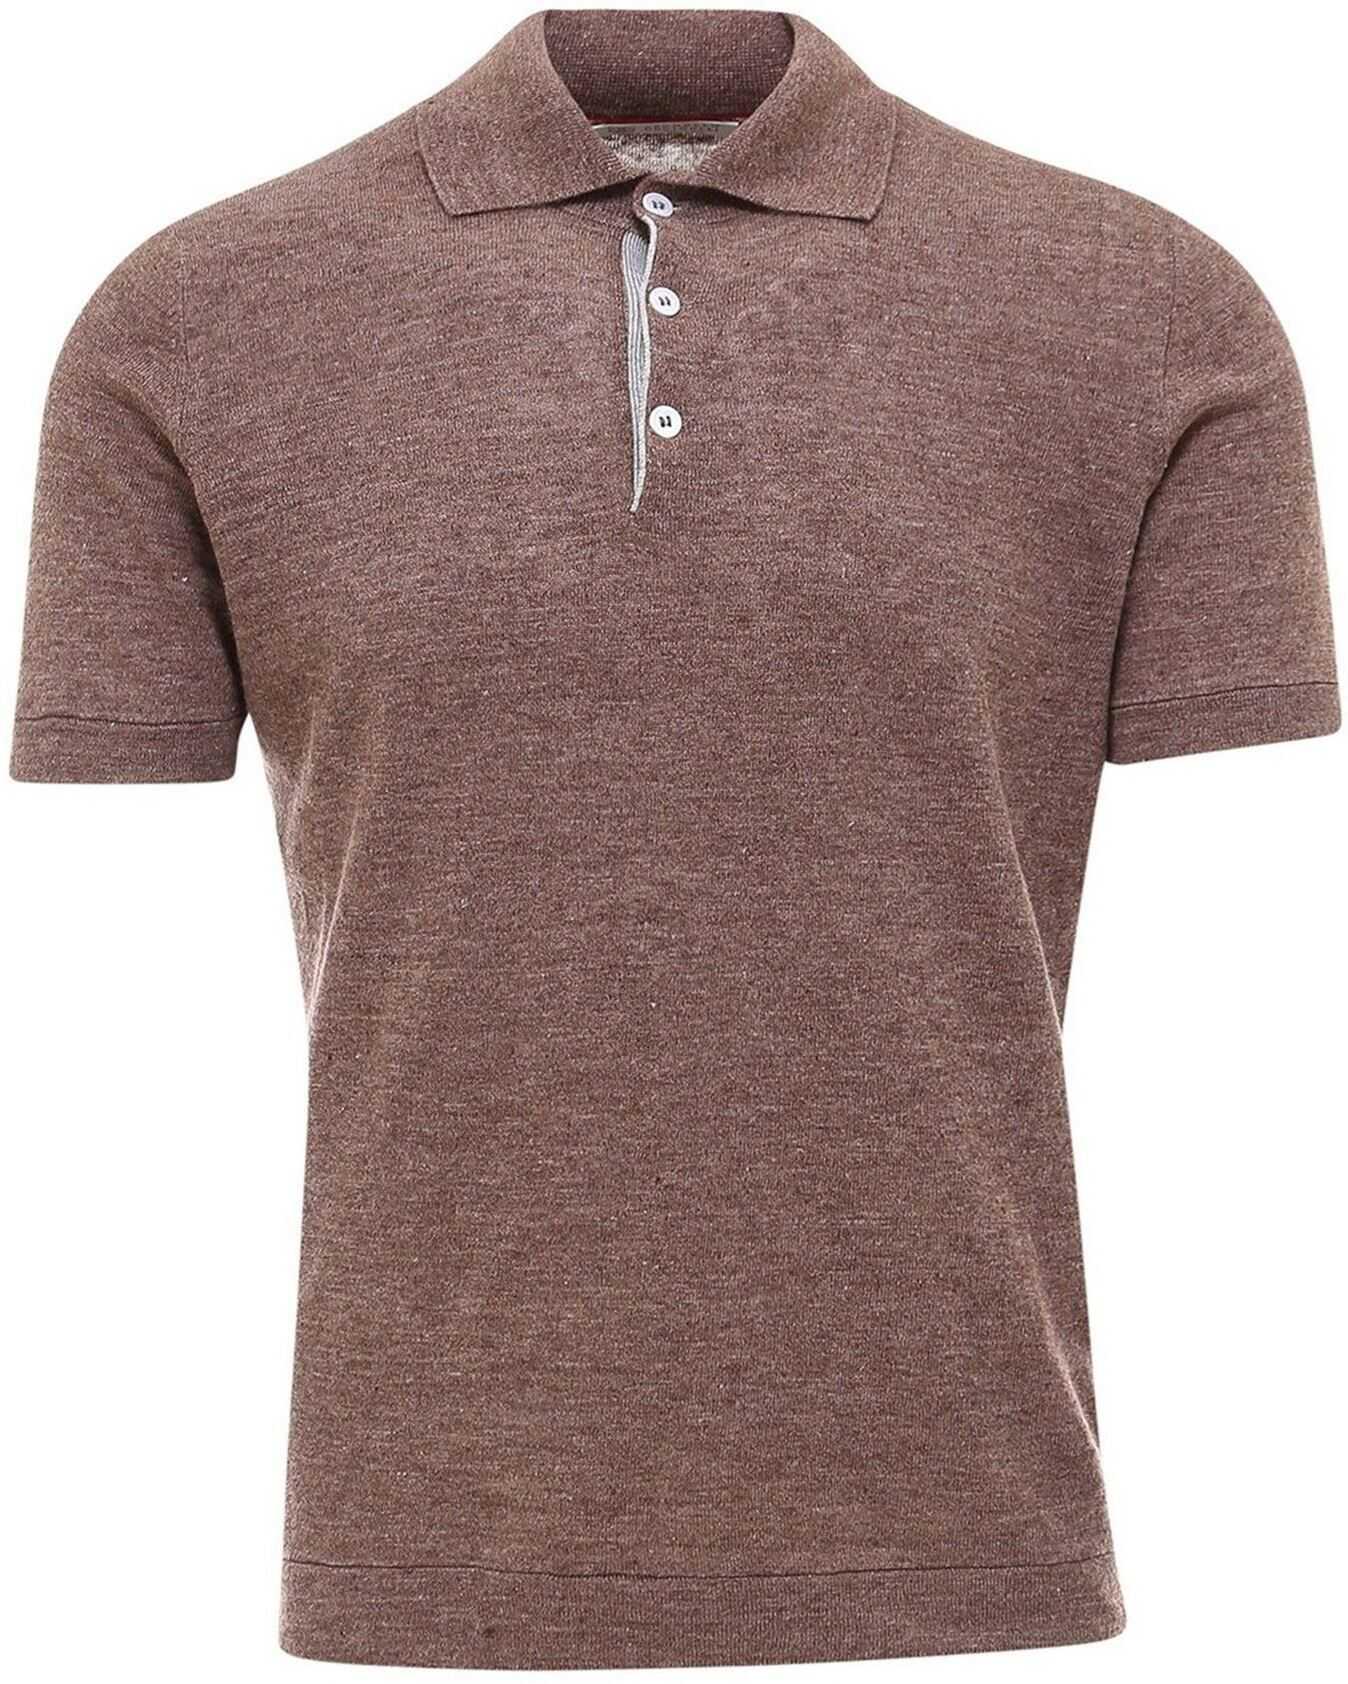 Brunello Cucinelli Linen Polo Shirt In Brown Brown imagine